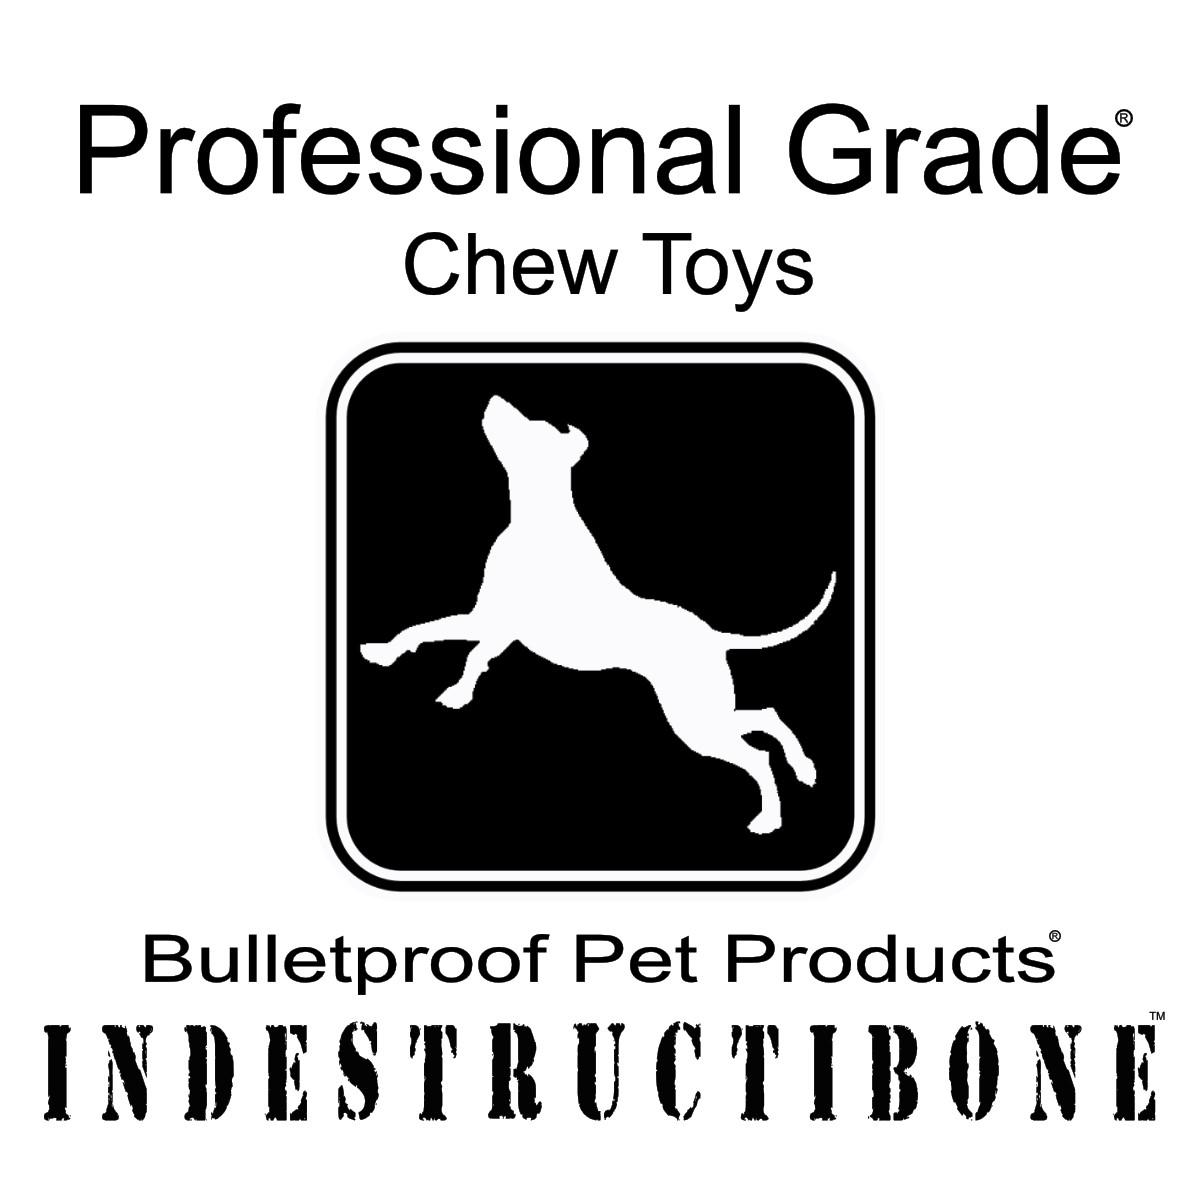 Bulletproof Pet Products Logo